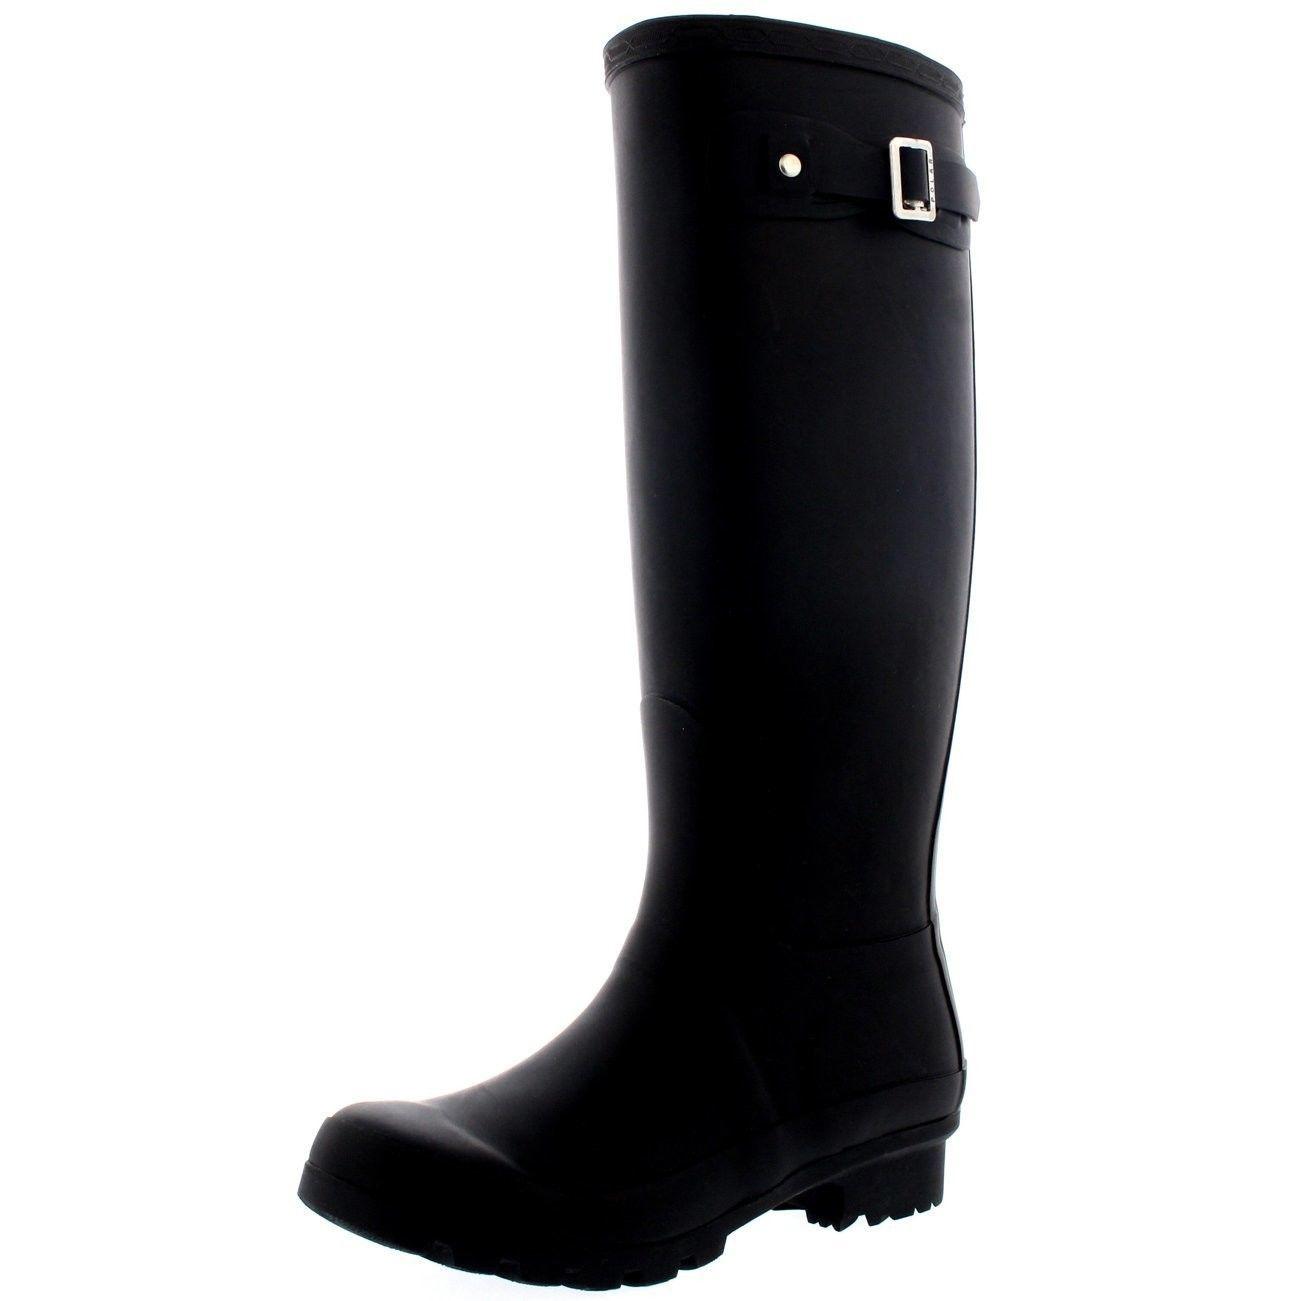 31c0ca178 56.72 | Womens Original Tall Snow Winter Wellington Waterproof Rain Wellies  Boot Black 9 ❤ #womens #original #winter #wellington #waterproof #wellies  ...